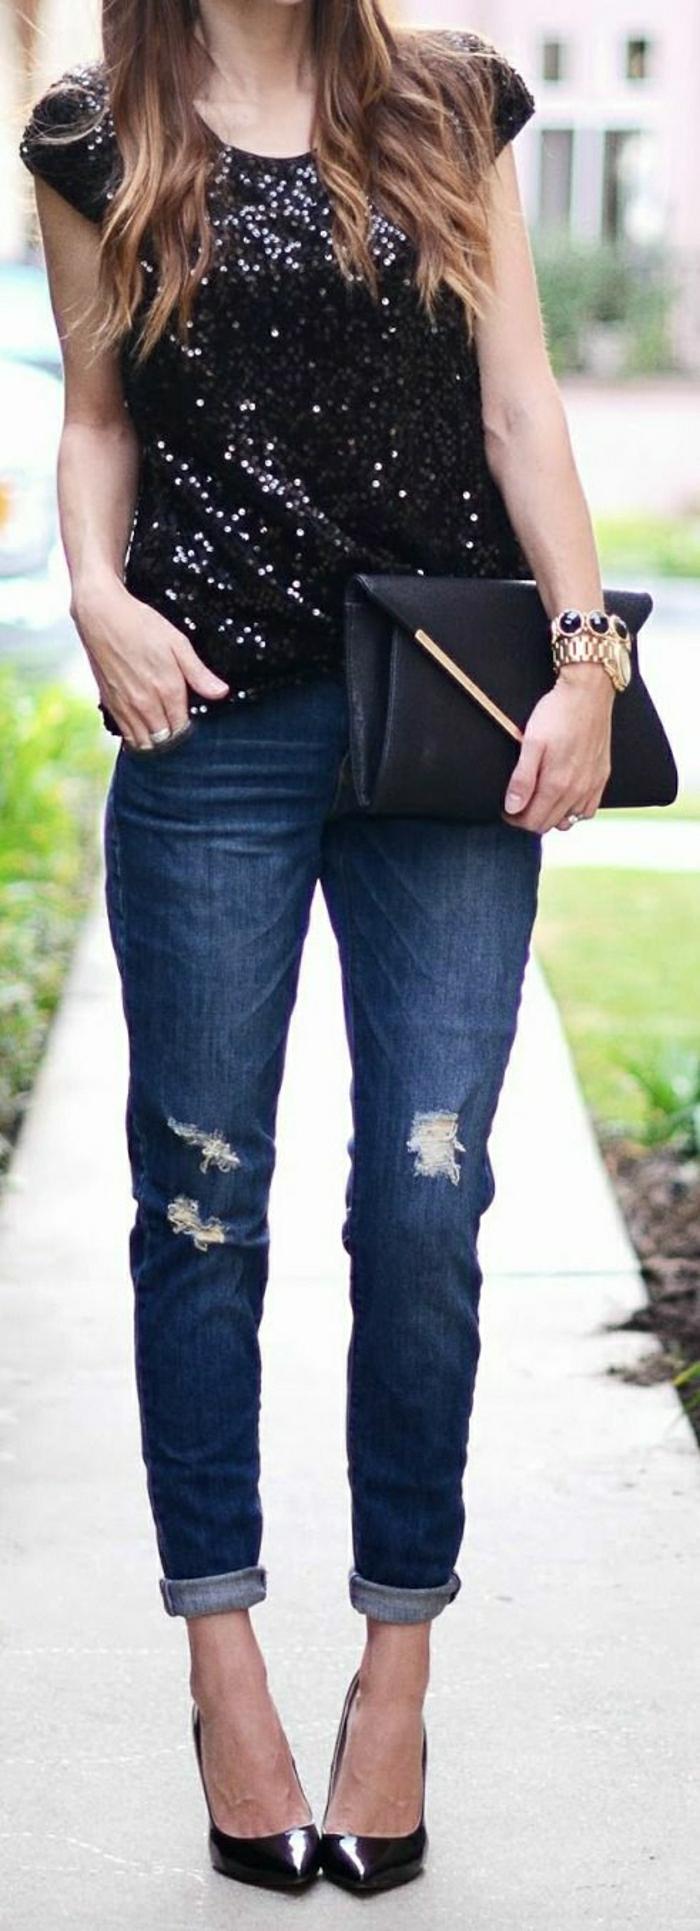 elegante-schwarze-Clutch-Top-Jeans-Stöckelschuhe-goldene-Armbanduhr